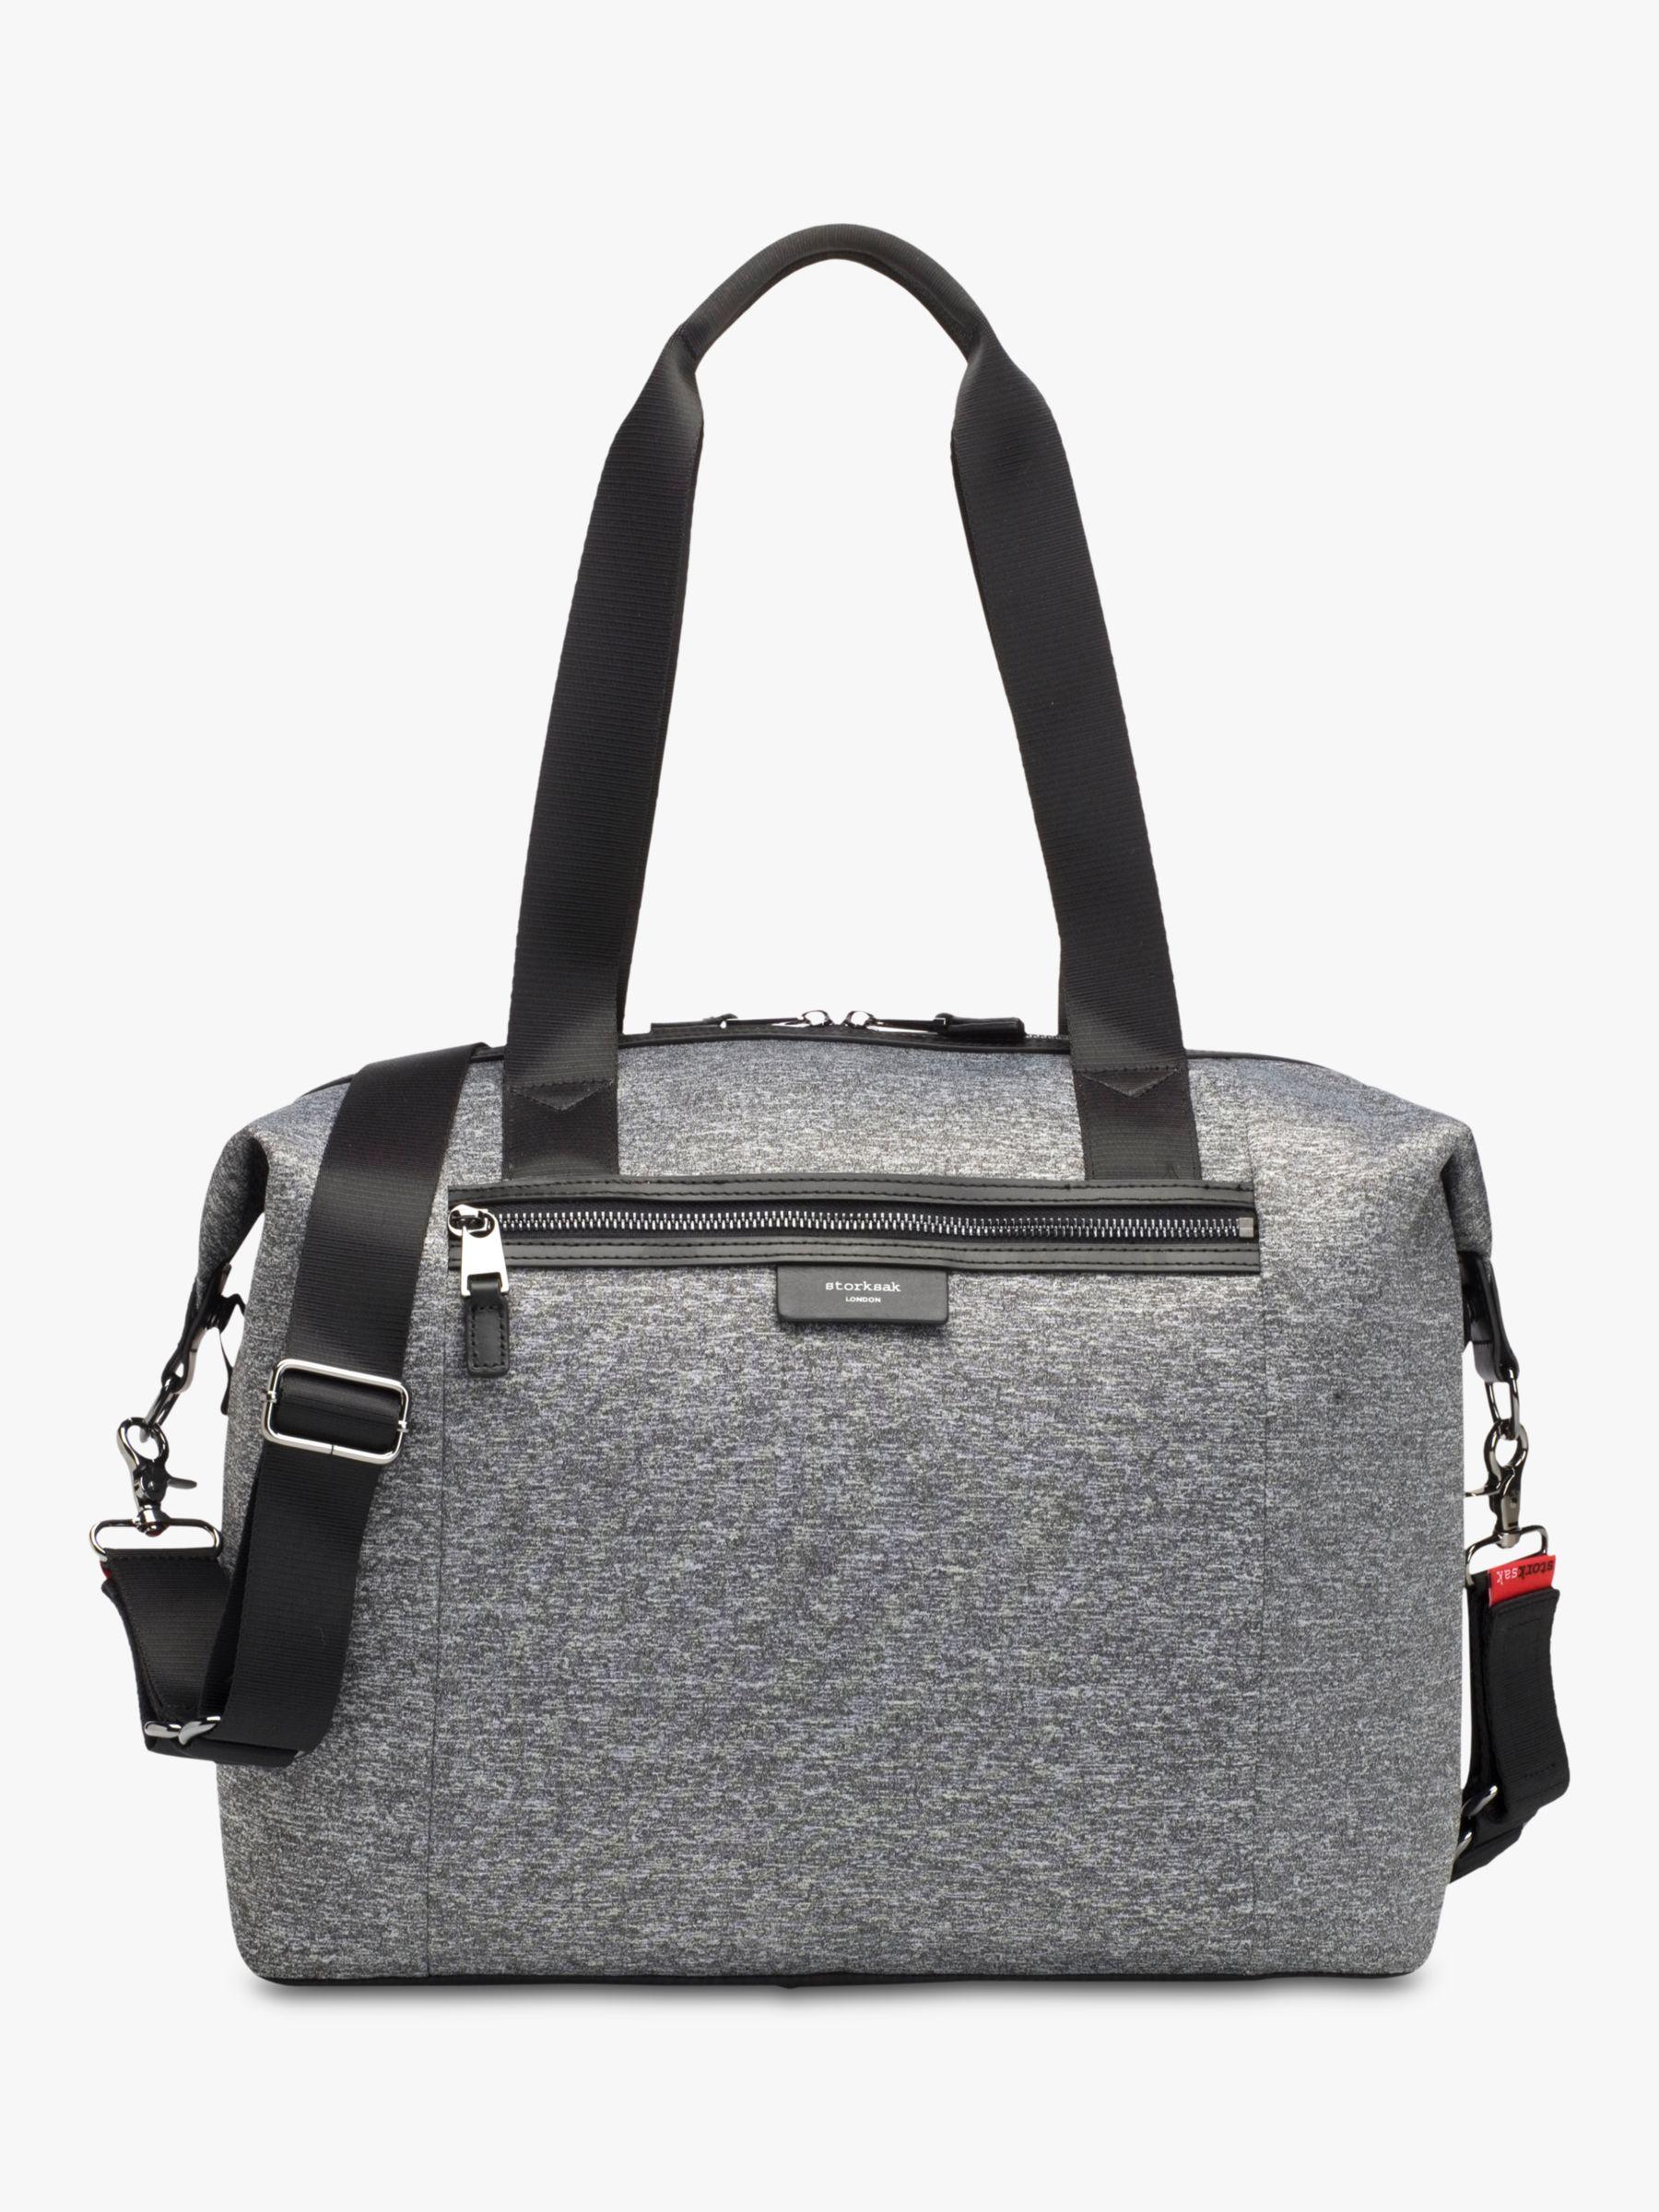 Storksak Storksak Stevie Luxe Changing Bag, Grey Marl Scuba